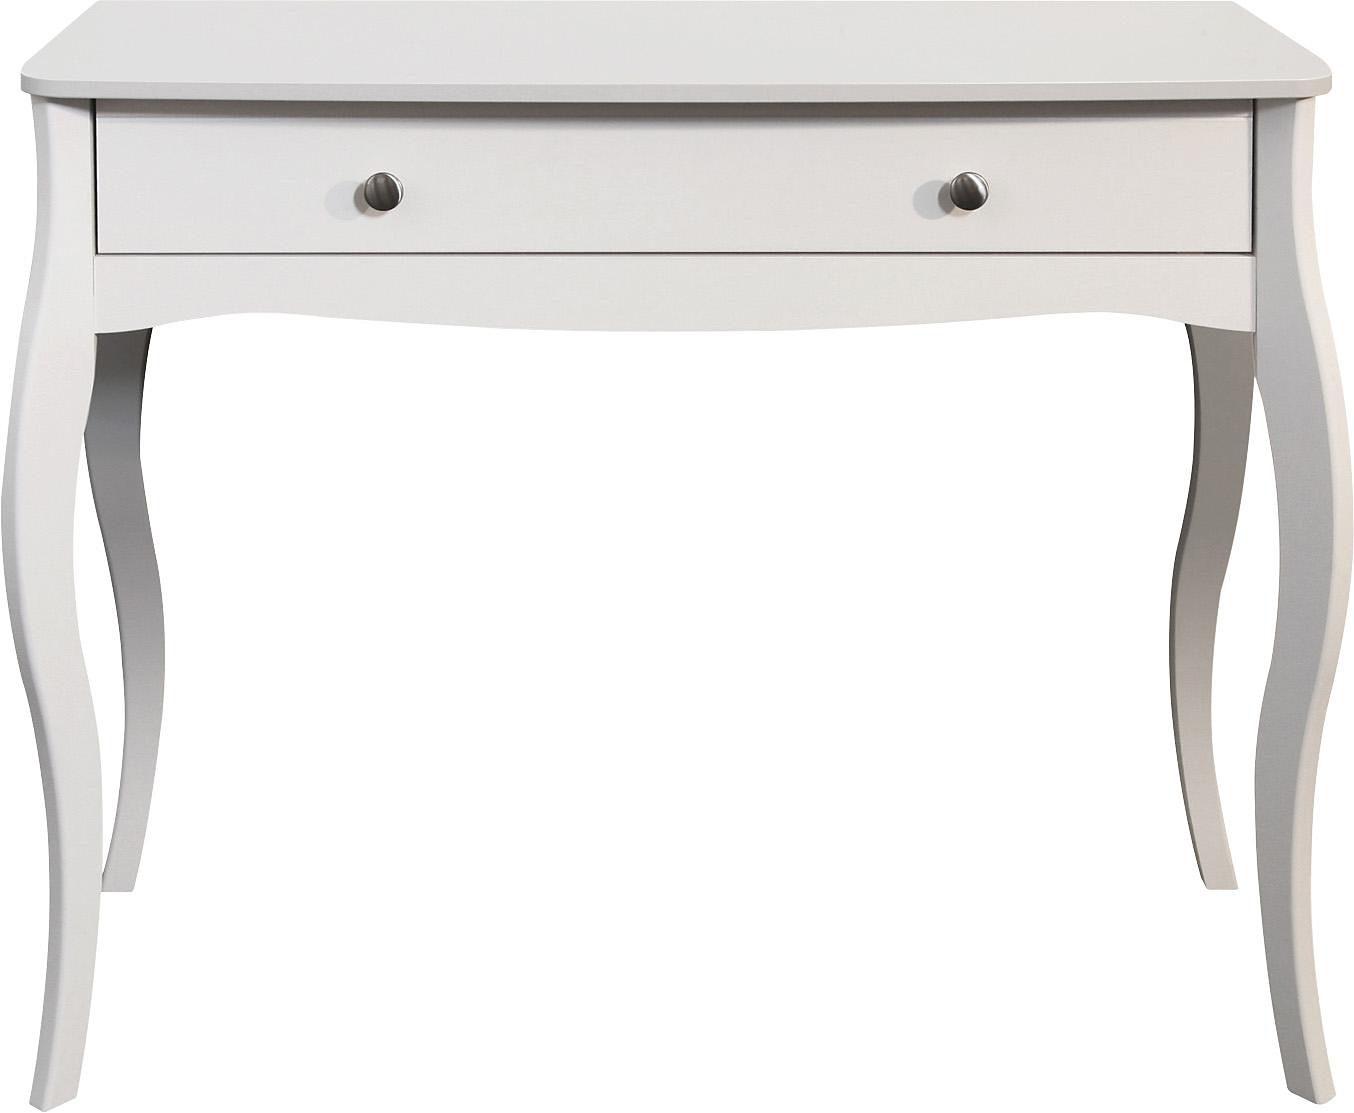 home affaire konsole baroque breite 100 cm auf rechnung. Black Bedroom Furniture Sets. Home Design Ideas